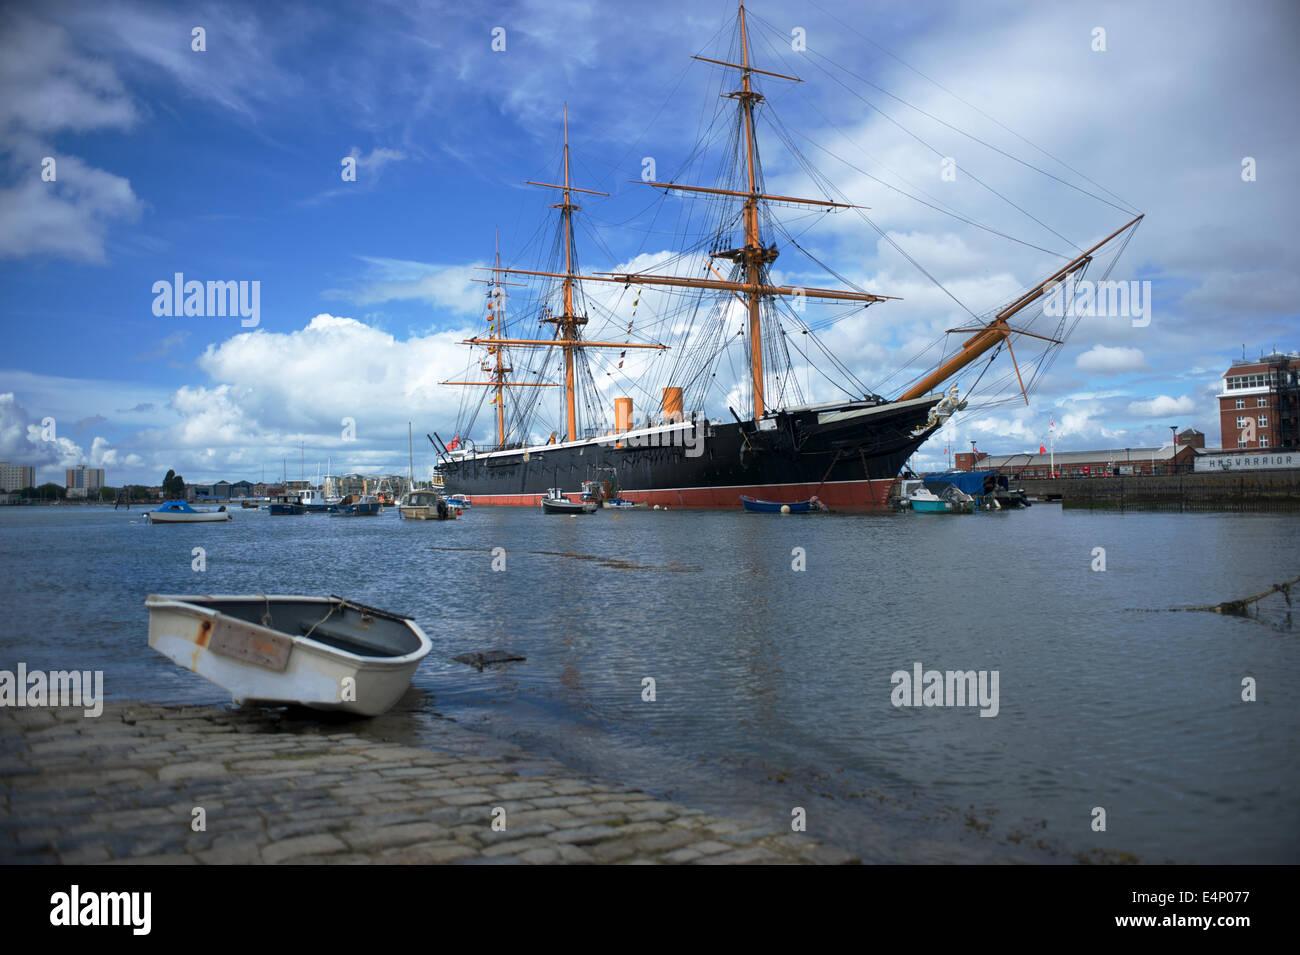 HMS Warrior, Portsmouth docks. Stock Photo